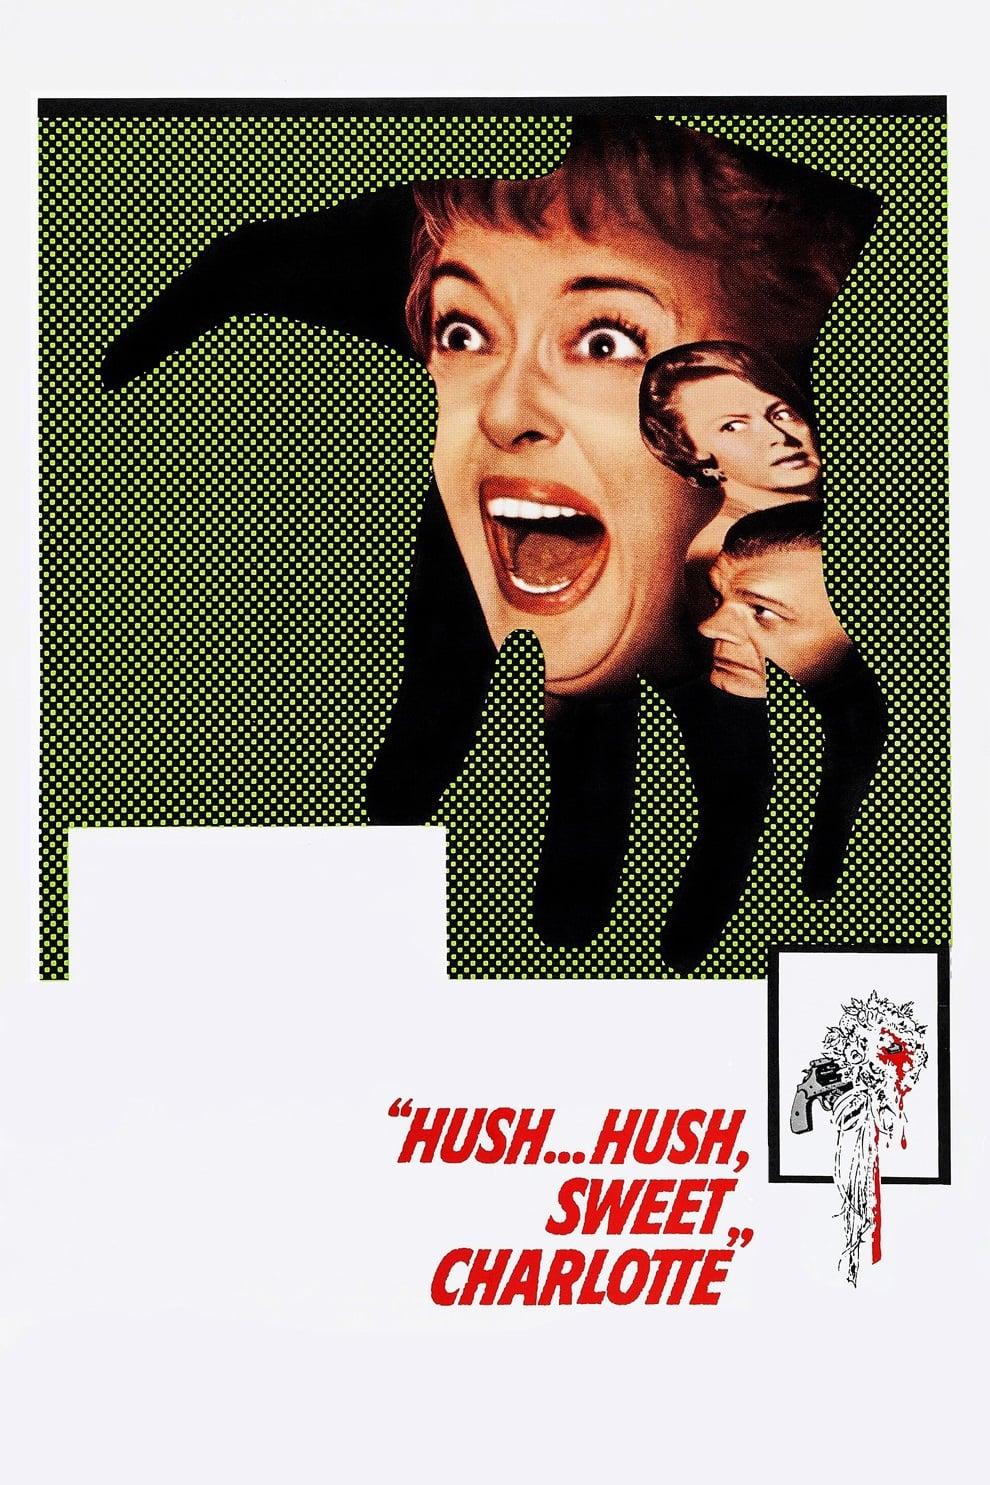 Hush... Hush, Sweet Charlotte (1964)